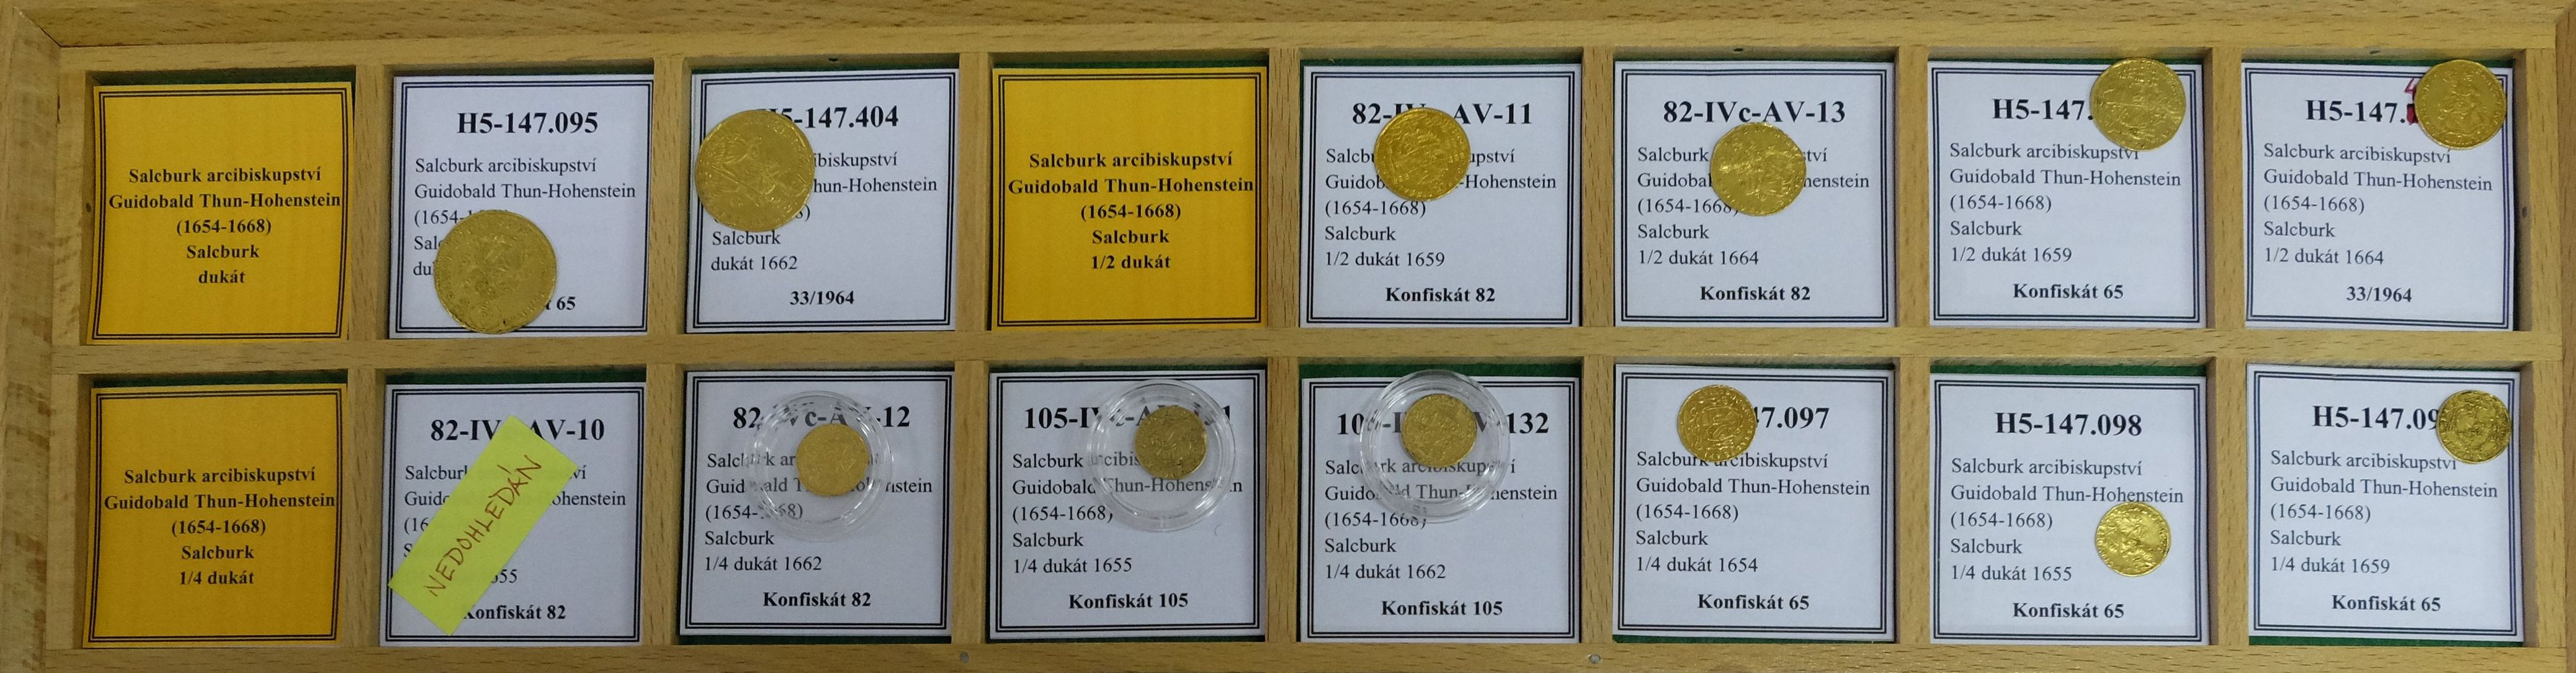 Inventarsystem im Prager Münzkabinett